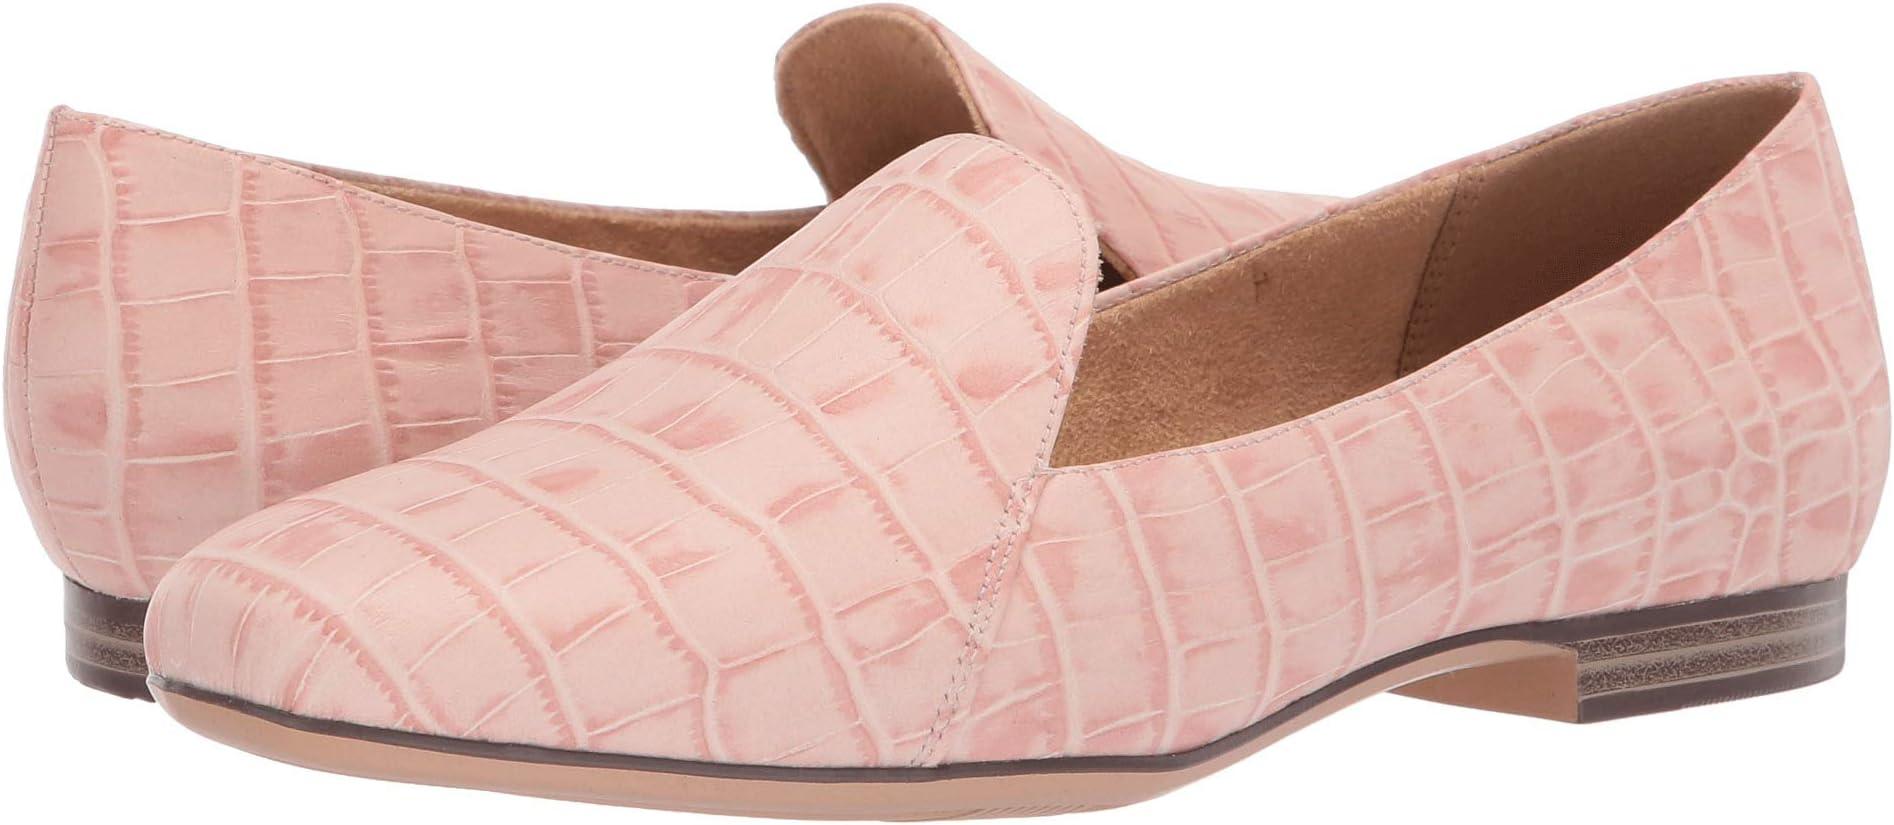 97b38b82918 Naturalizer Sandals